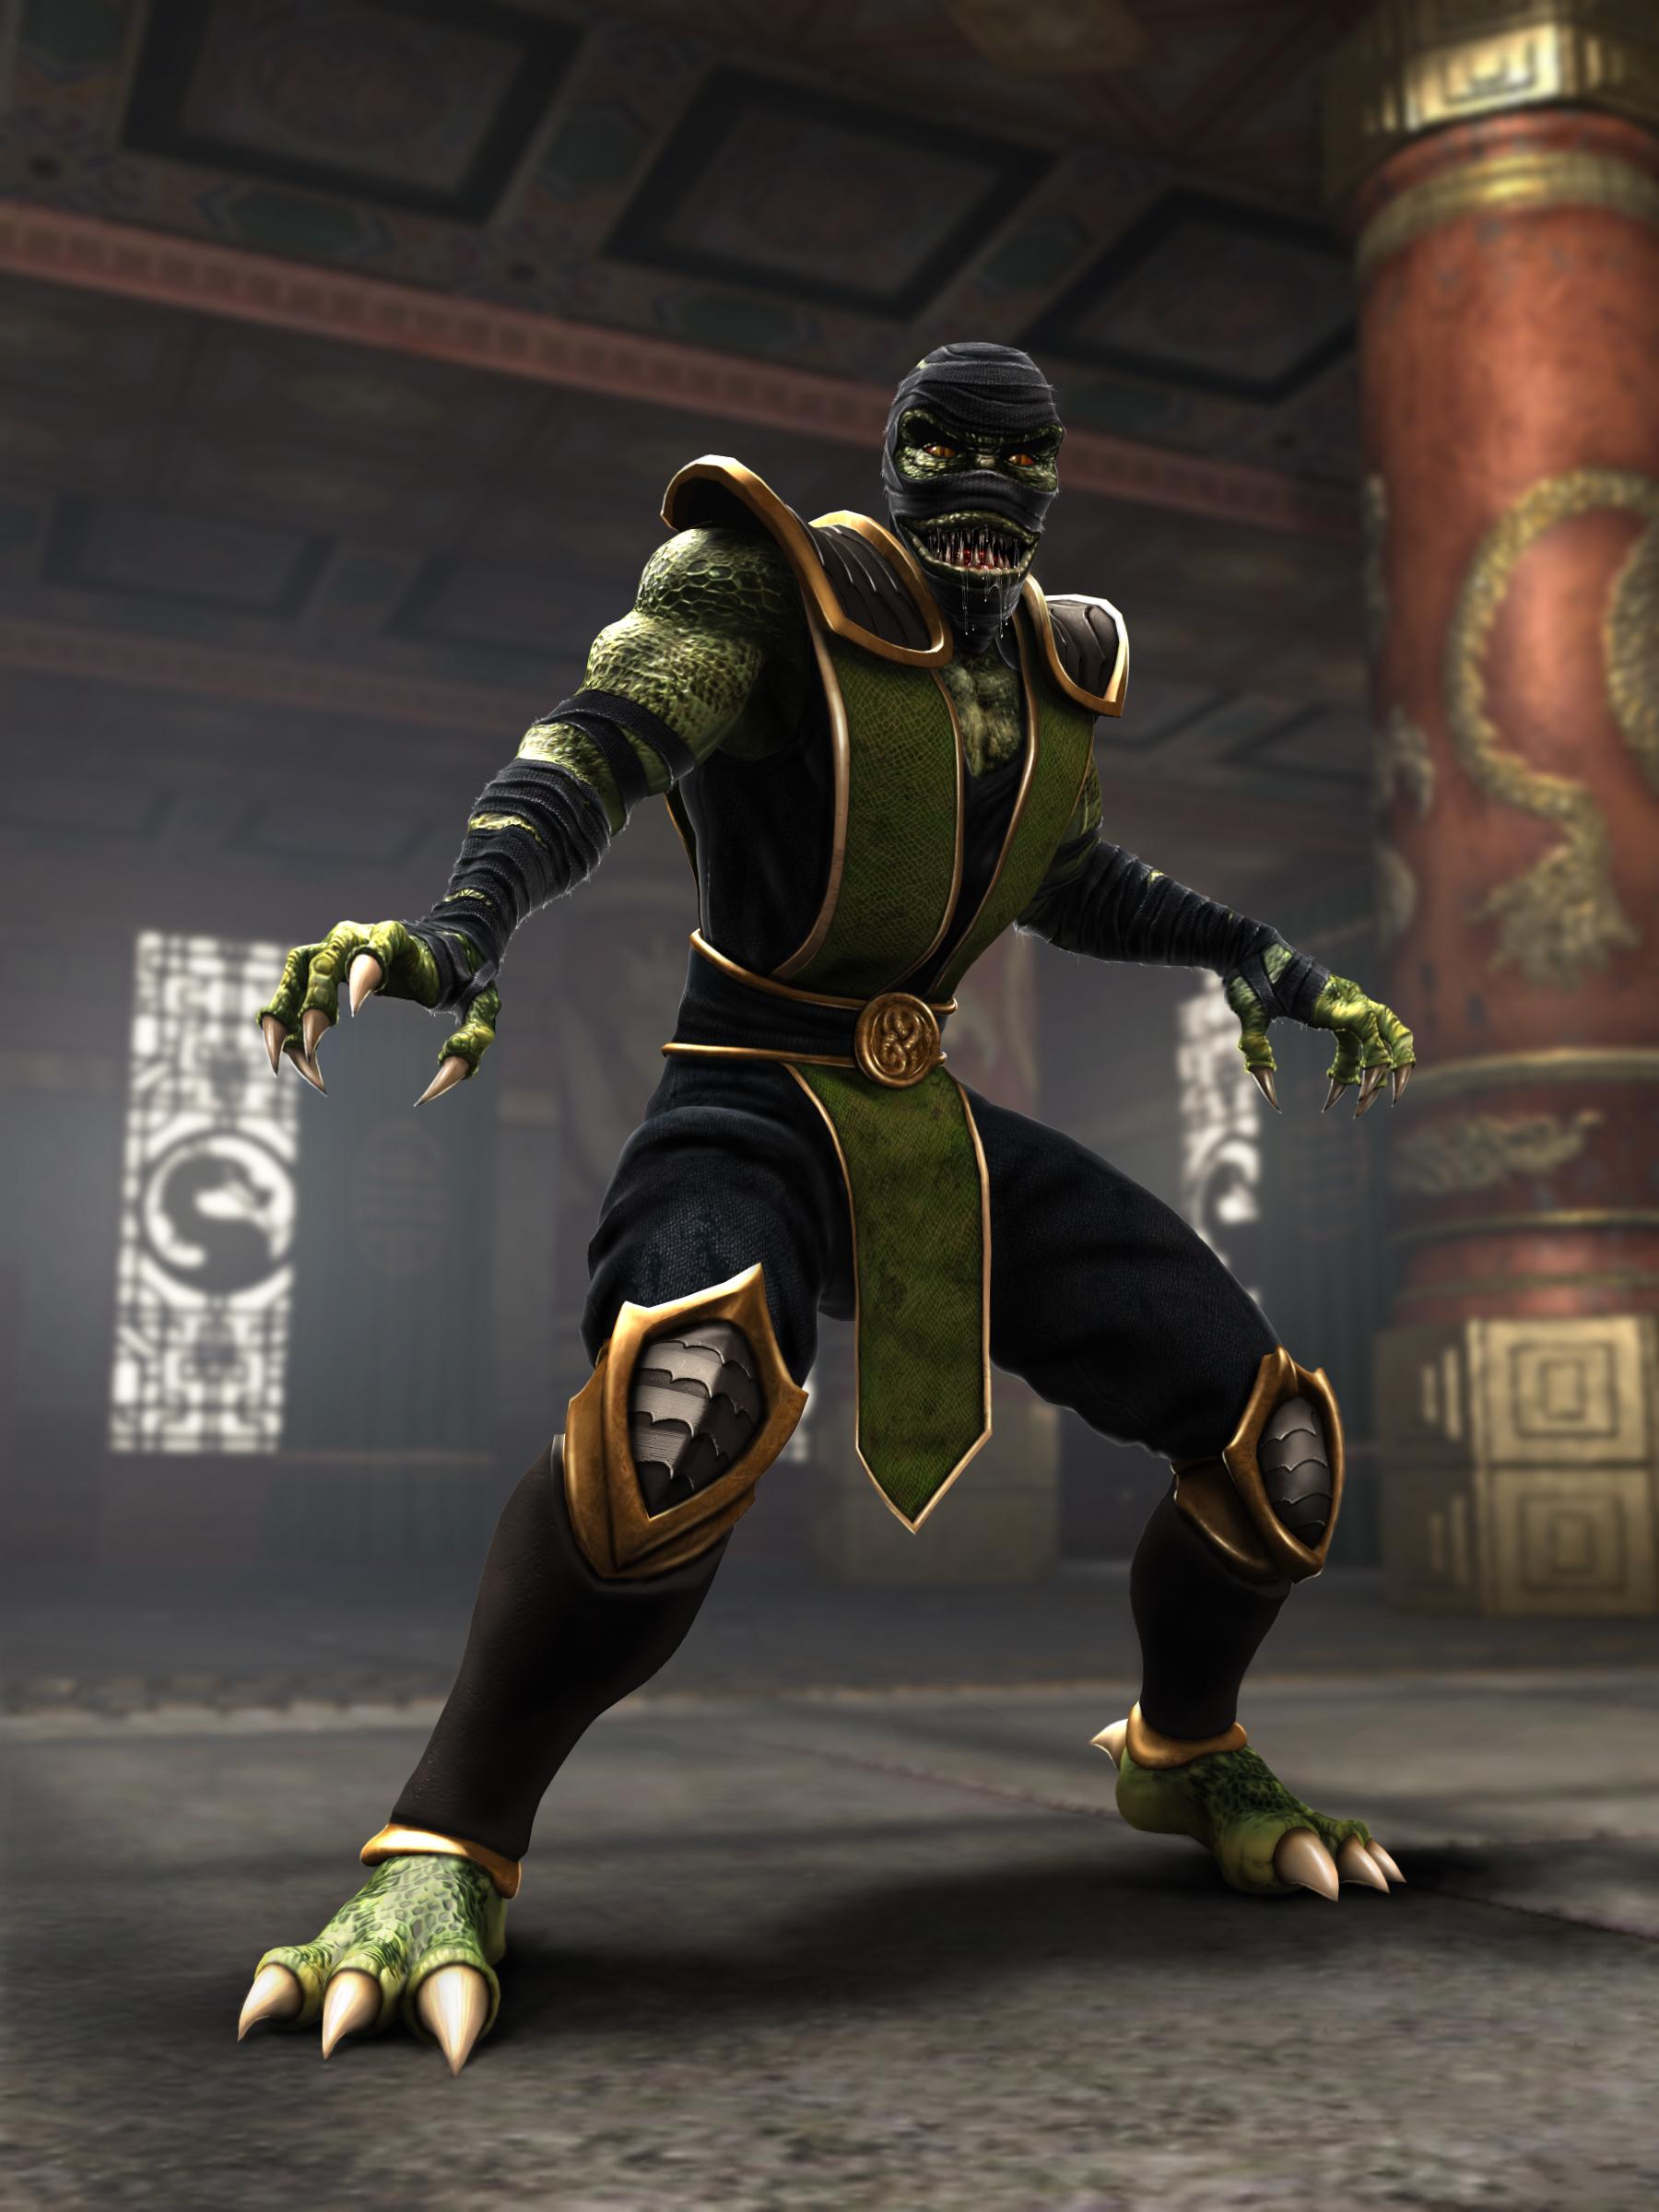 Reptile's semi-reptilian appearance in Mortal Kombat: Shoalin Monks and Mortal Kombat: Armageddon